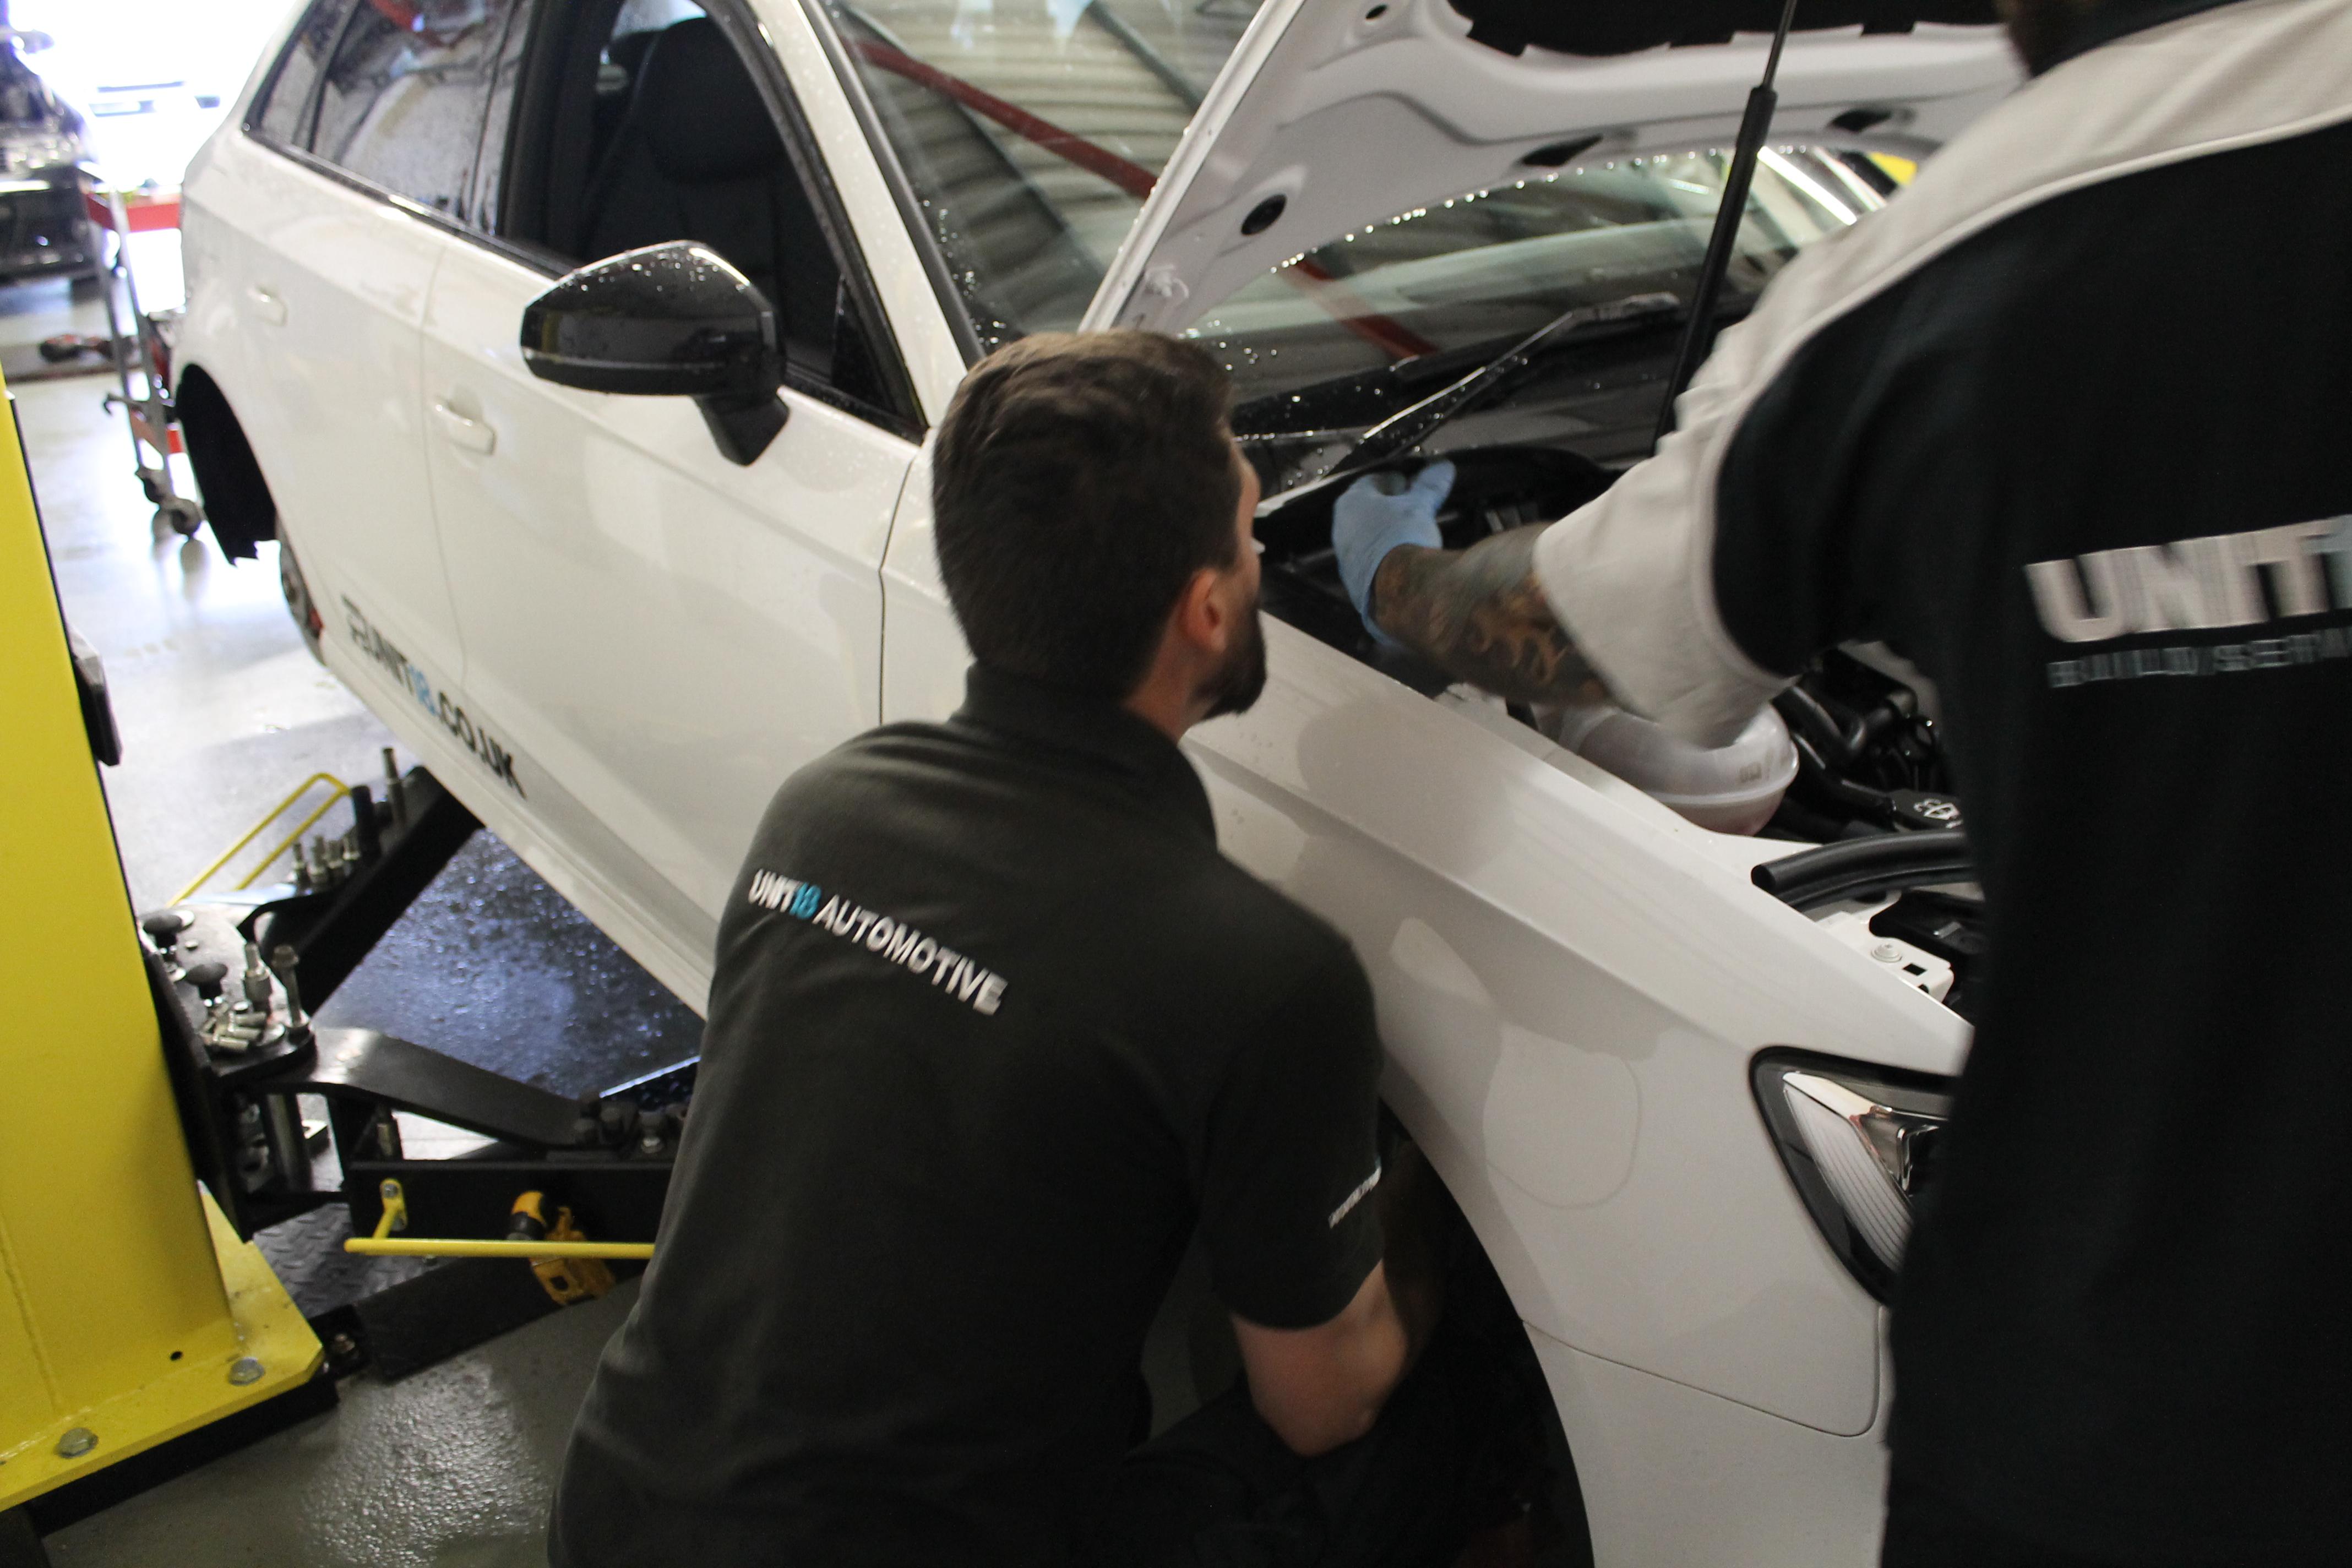 ali working on car